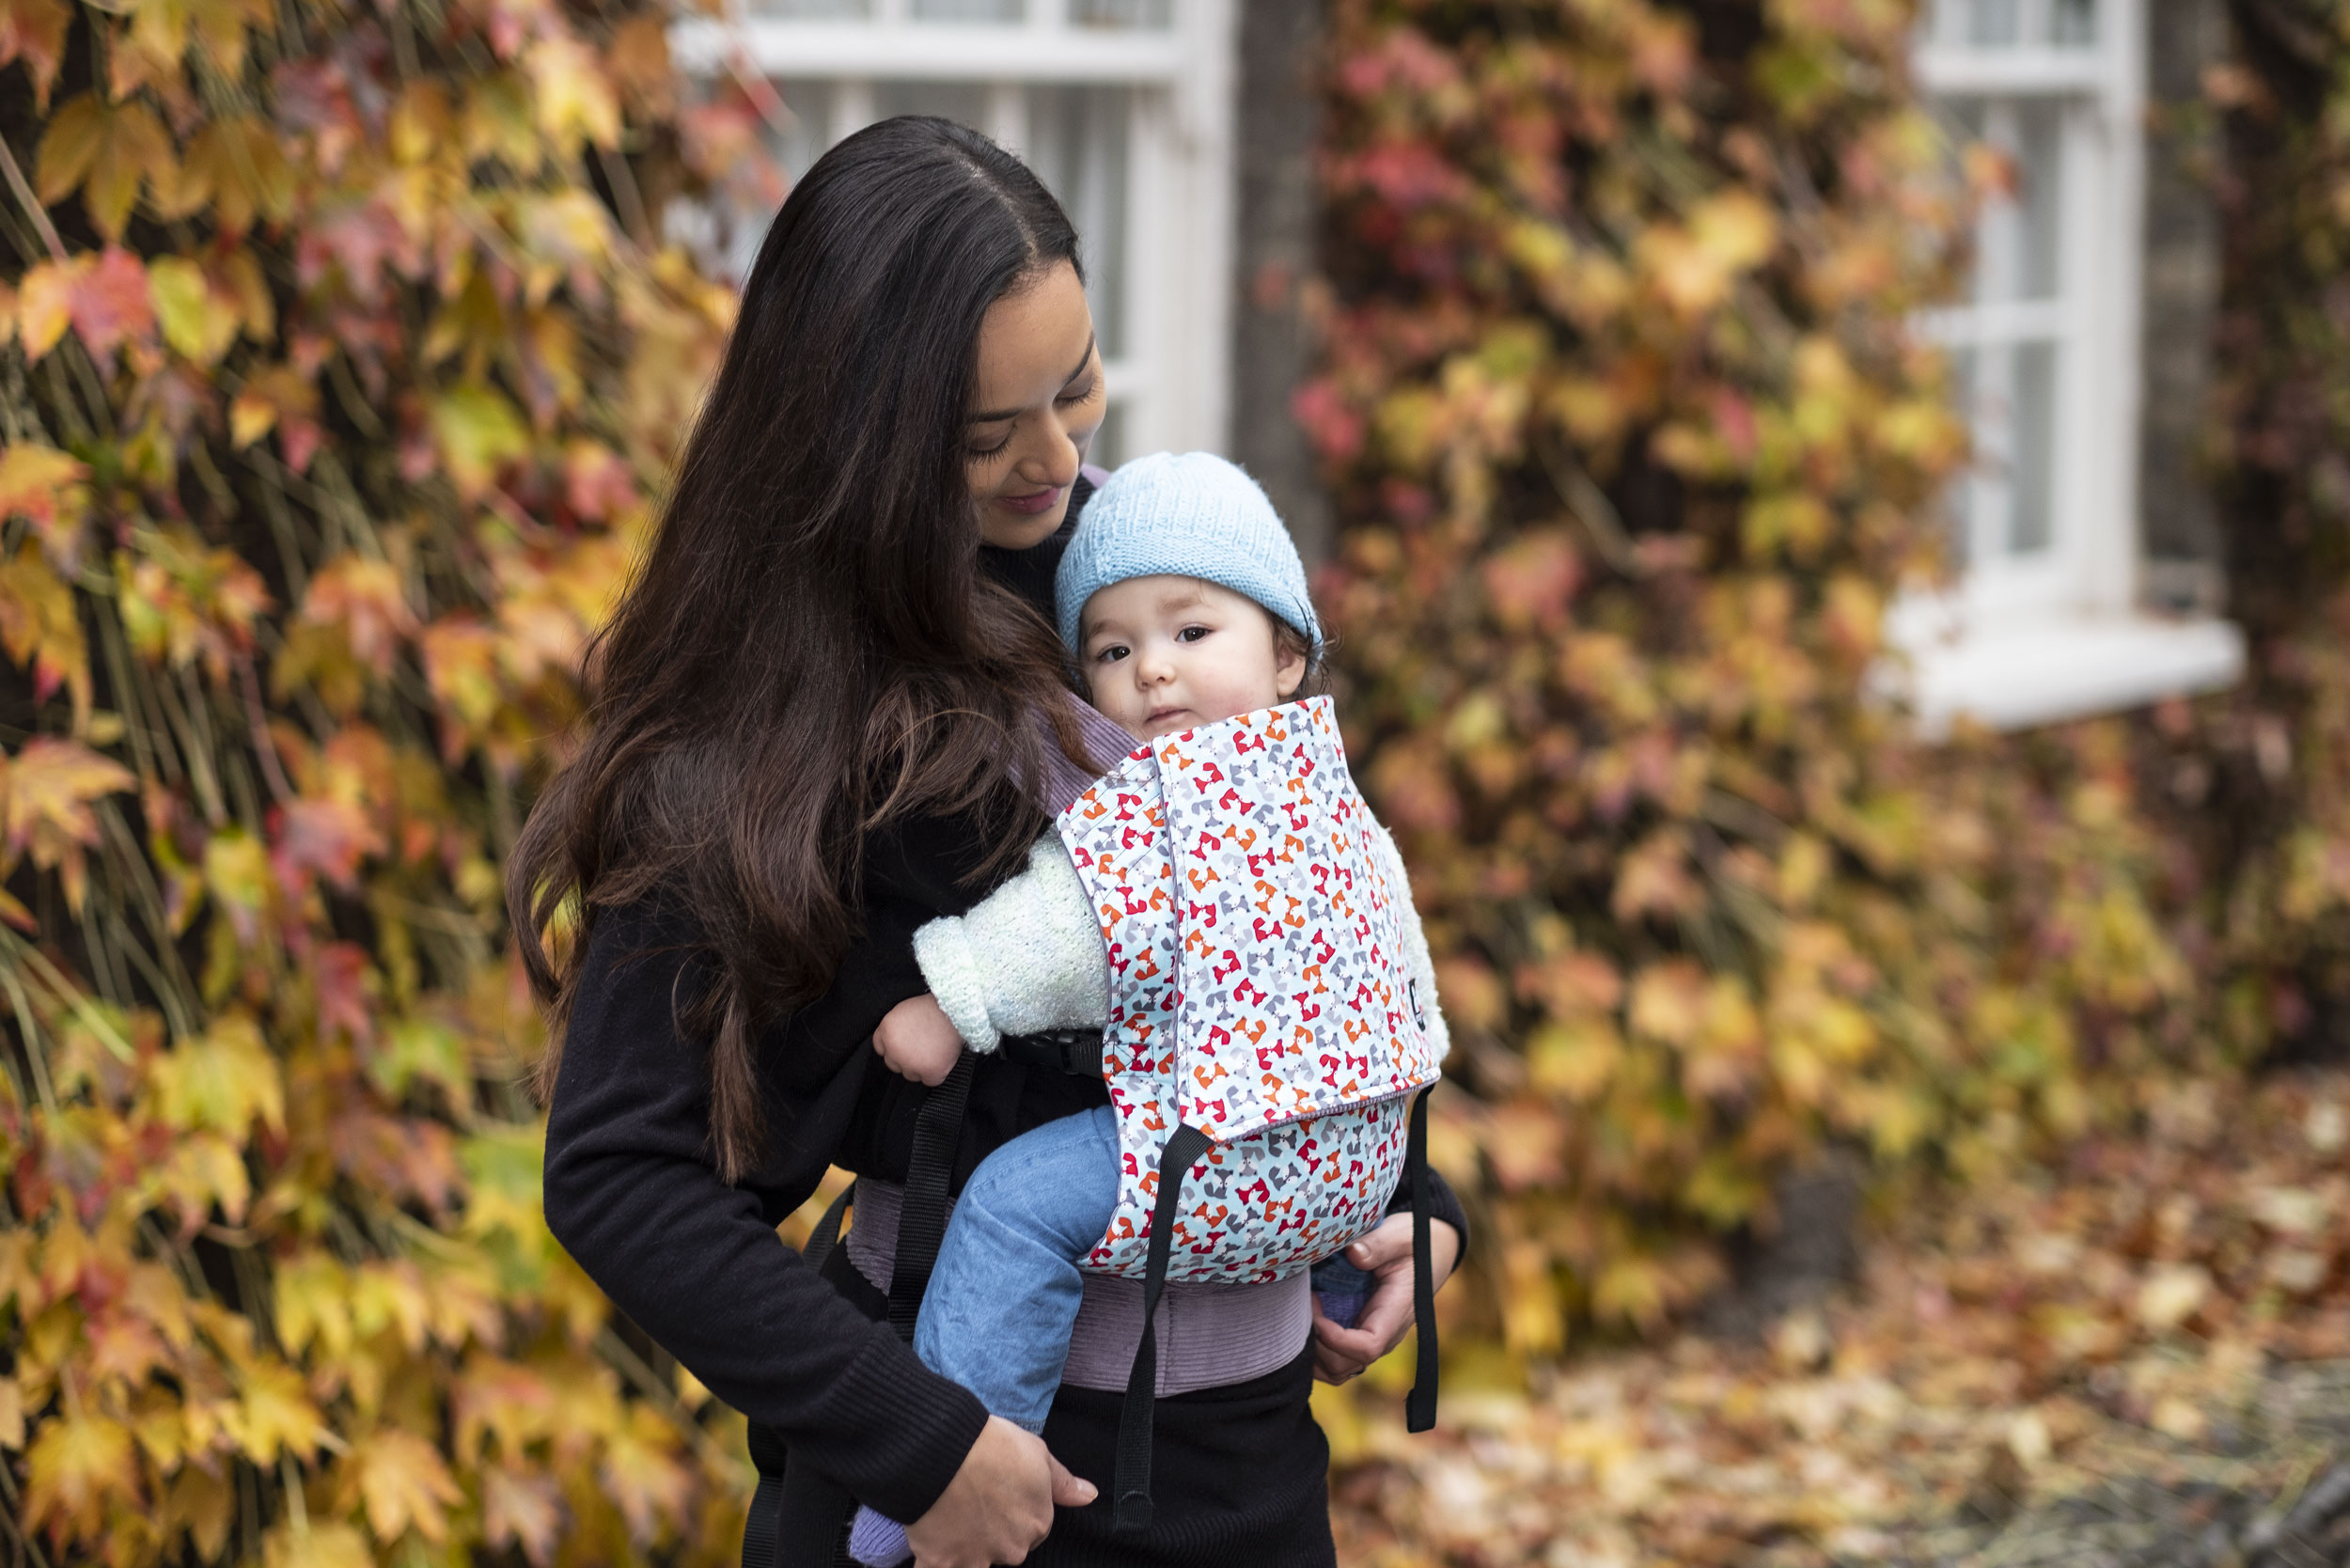 Sleepy-Nico-Fiona-Burrage-Photographer-Norwich-Baby-Carrier.jpg